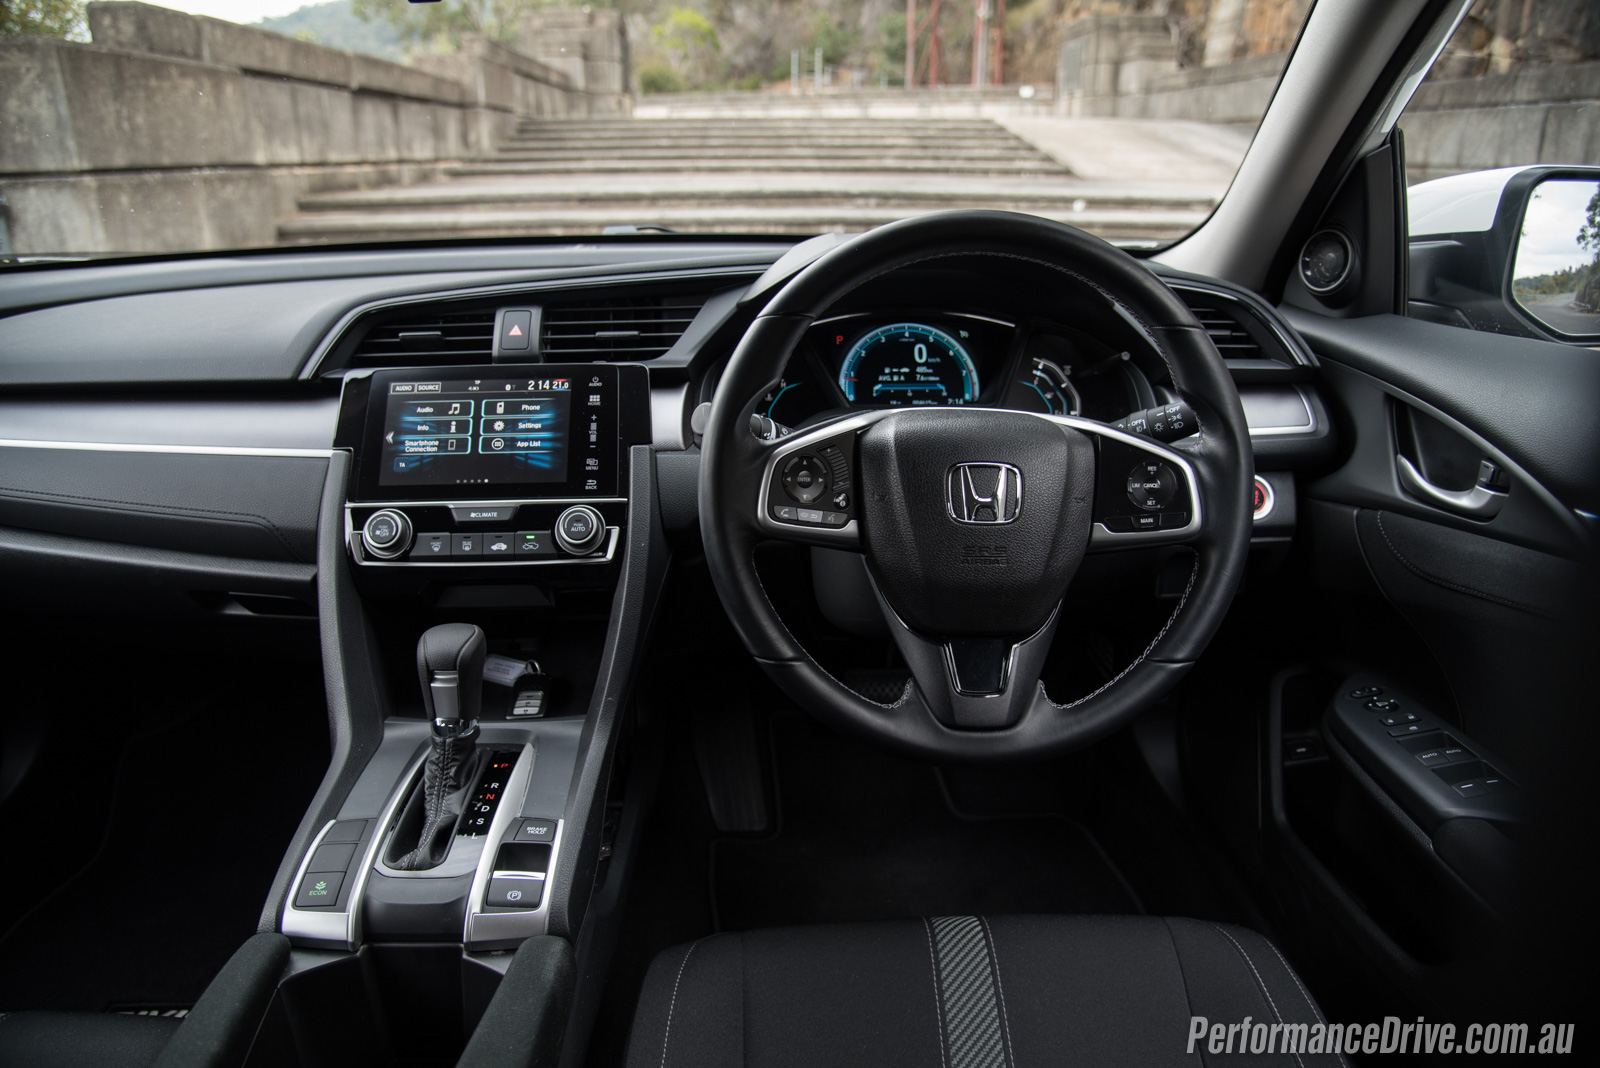 2016 Honda Civic VTi-S sedan review (video) | PerformanceDrive